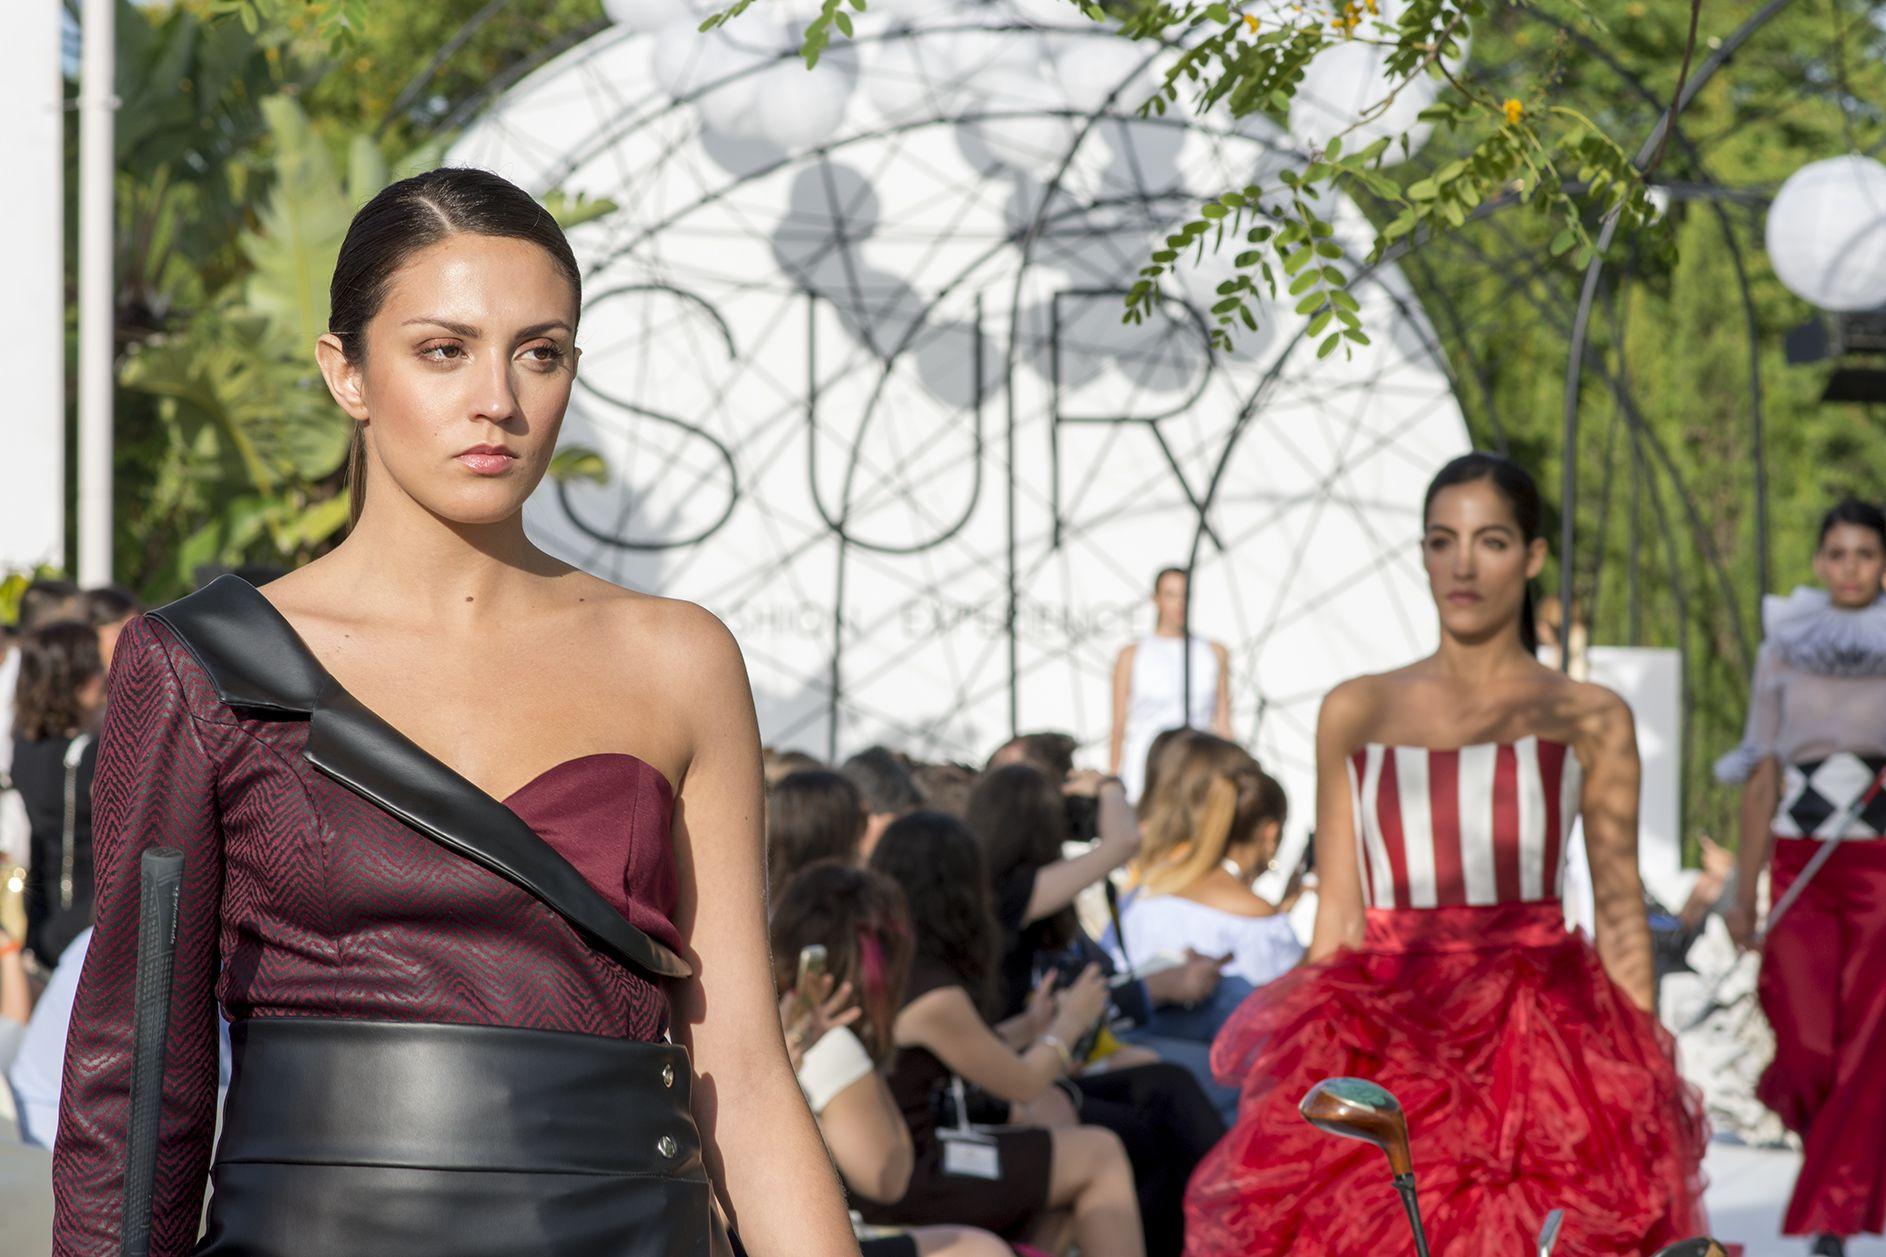 Pasarela de Moda de Sur Fashion Experience, Junio 2016, Jerez | Noelia Herrera de Jonocla Fotografía para MIRA Jerez